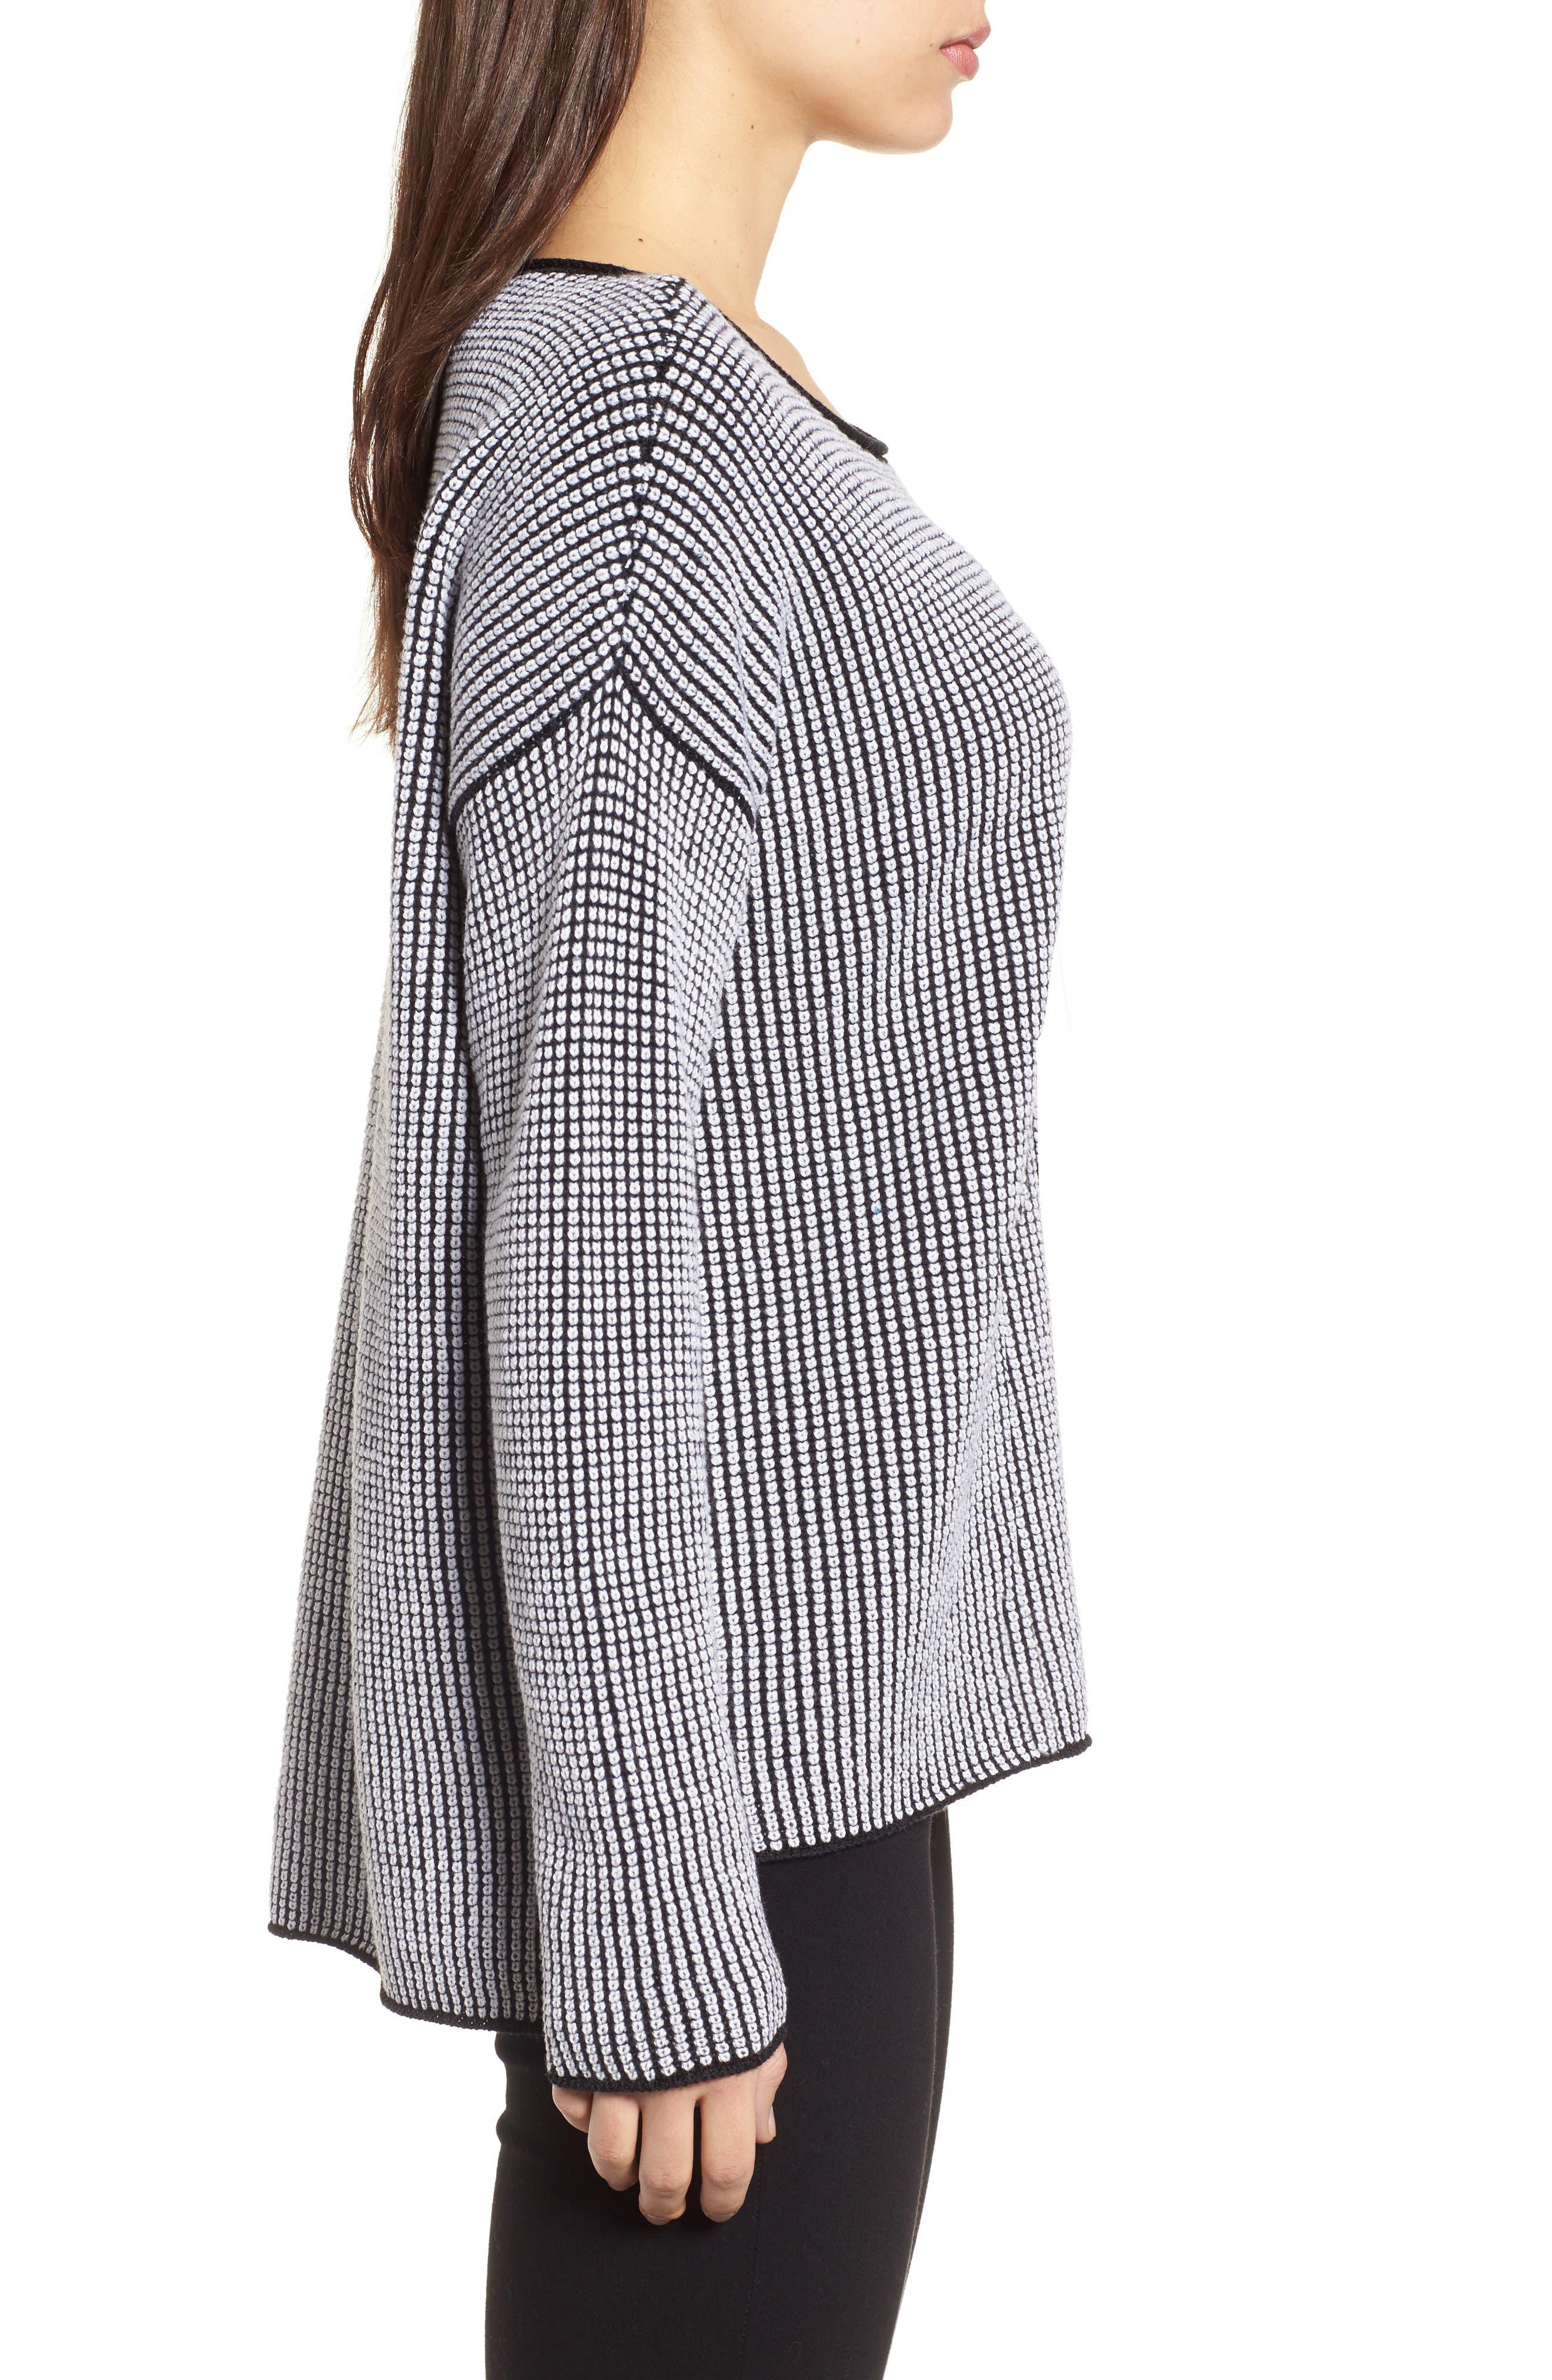 Textured Merino Wool Sweater,                             Alternate thumbnail 4, color,                             Black/ Soft White